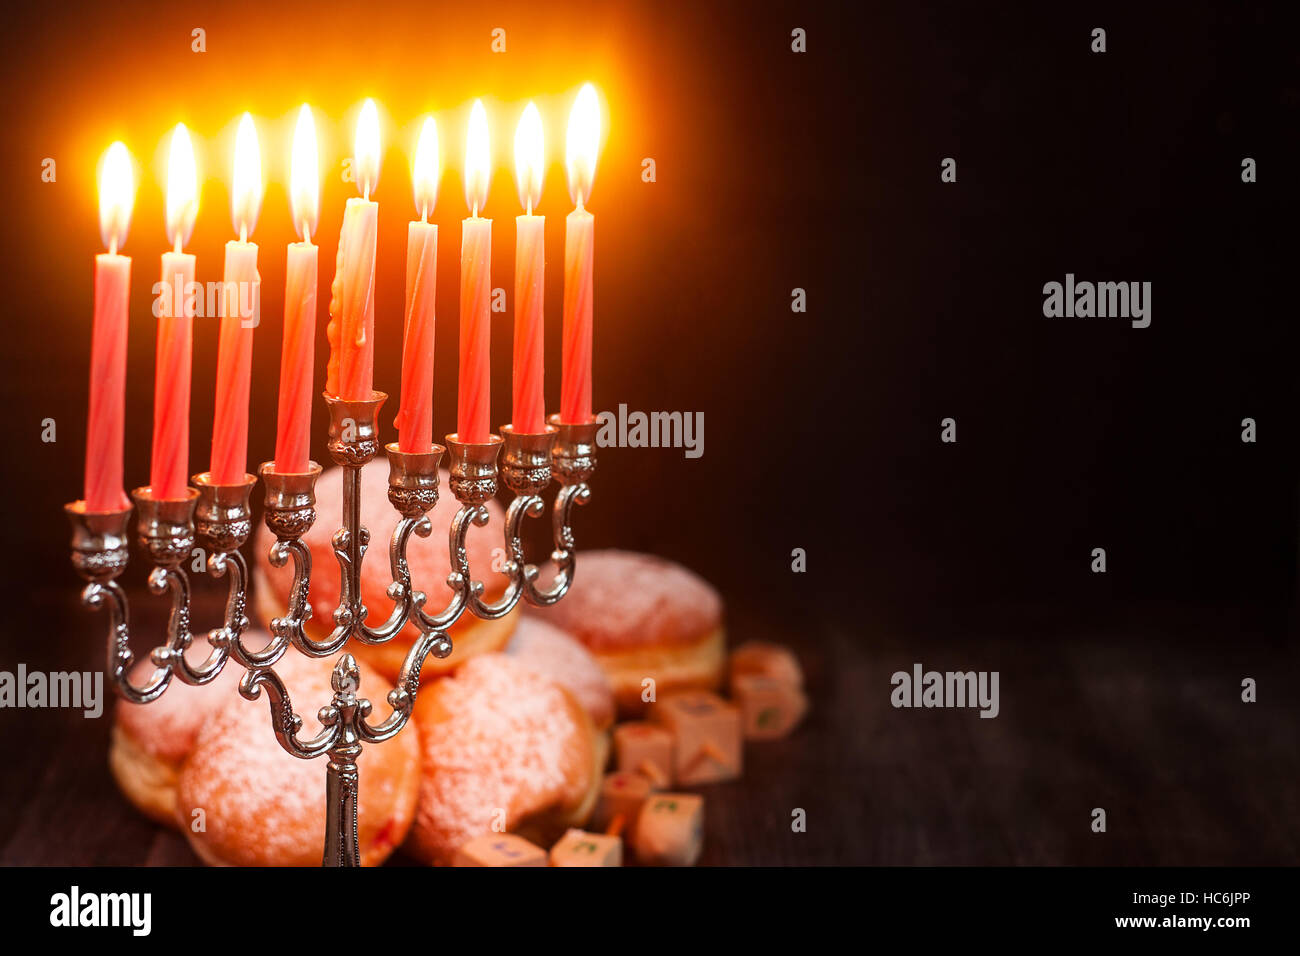 Symbols of jewish holiday hanukkah - menorah, donuts sufganiyot and dreidels - Stock Image